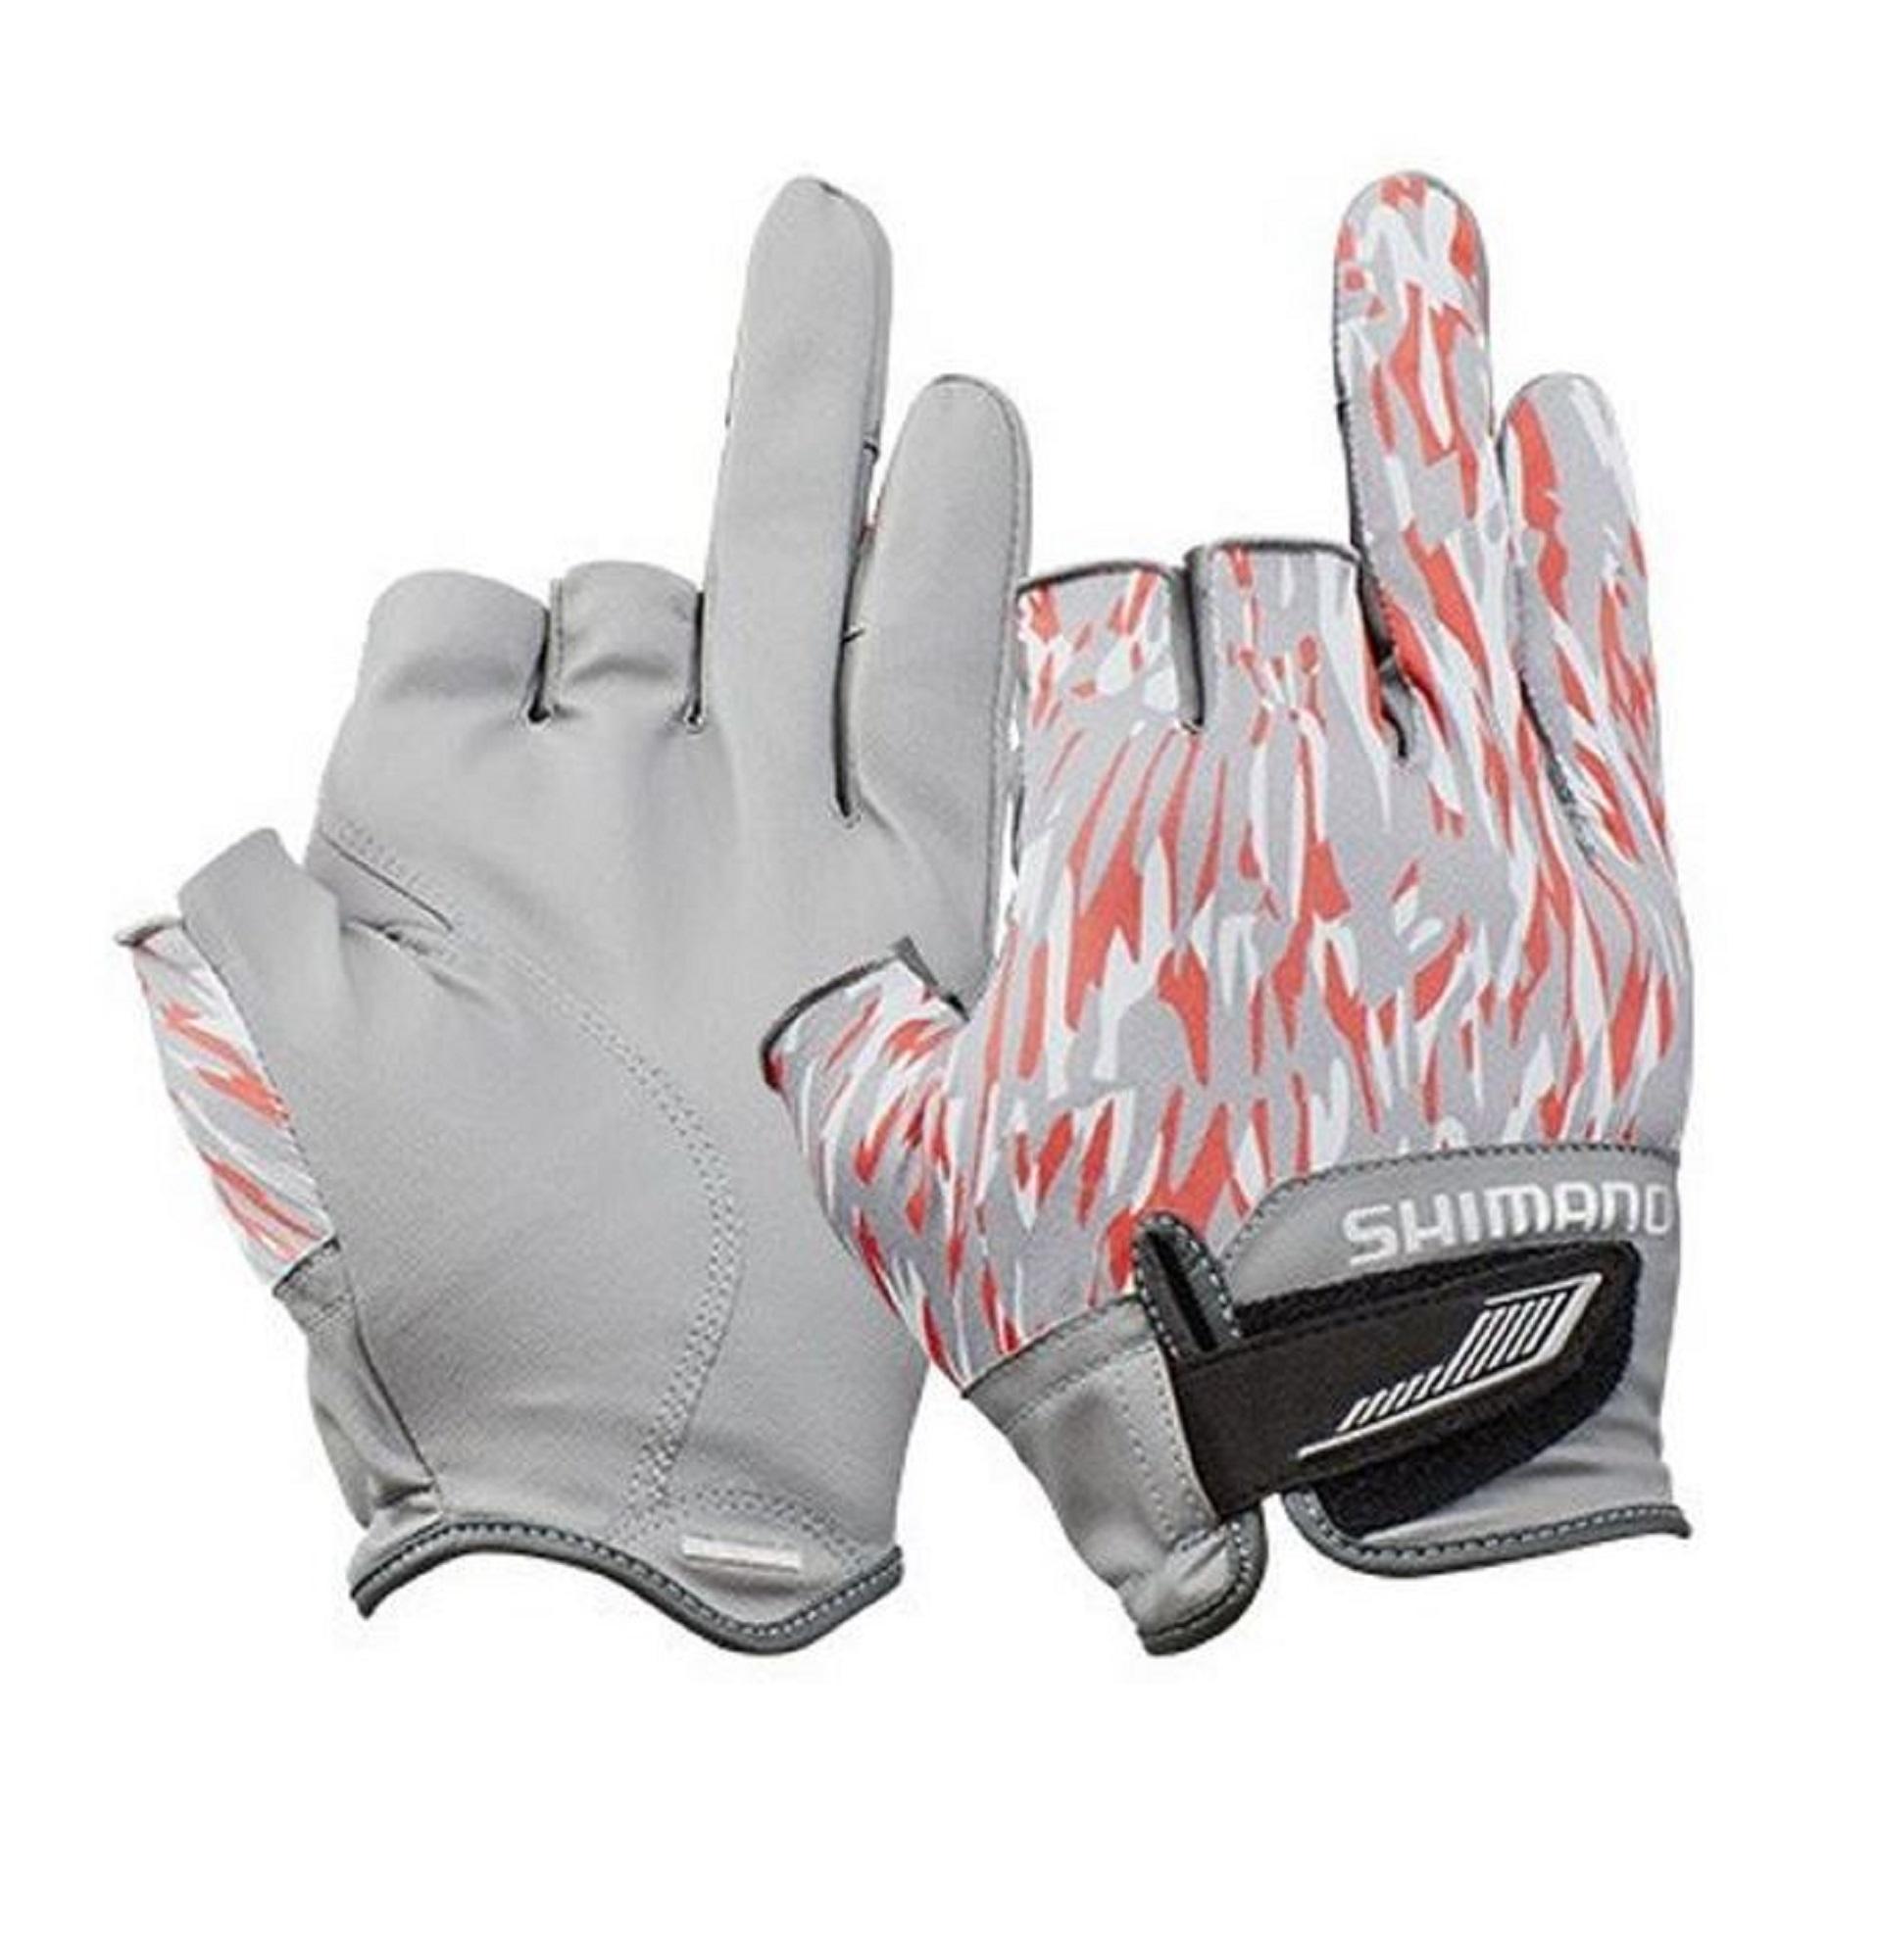 Shimano GL-021S Gloves 3D Casting 3 Fingerless Orange Camo Size L 669506